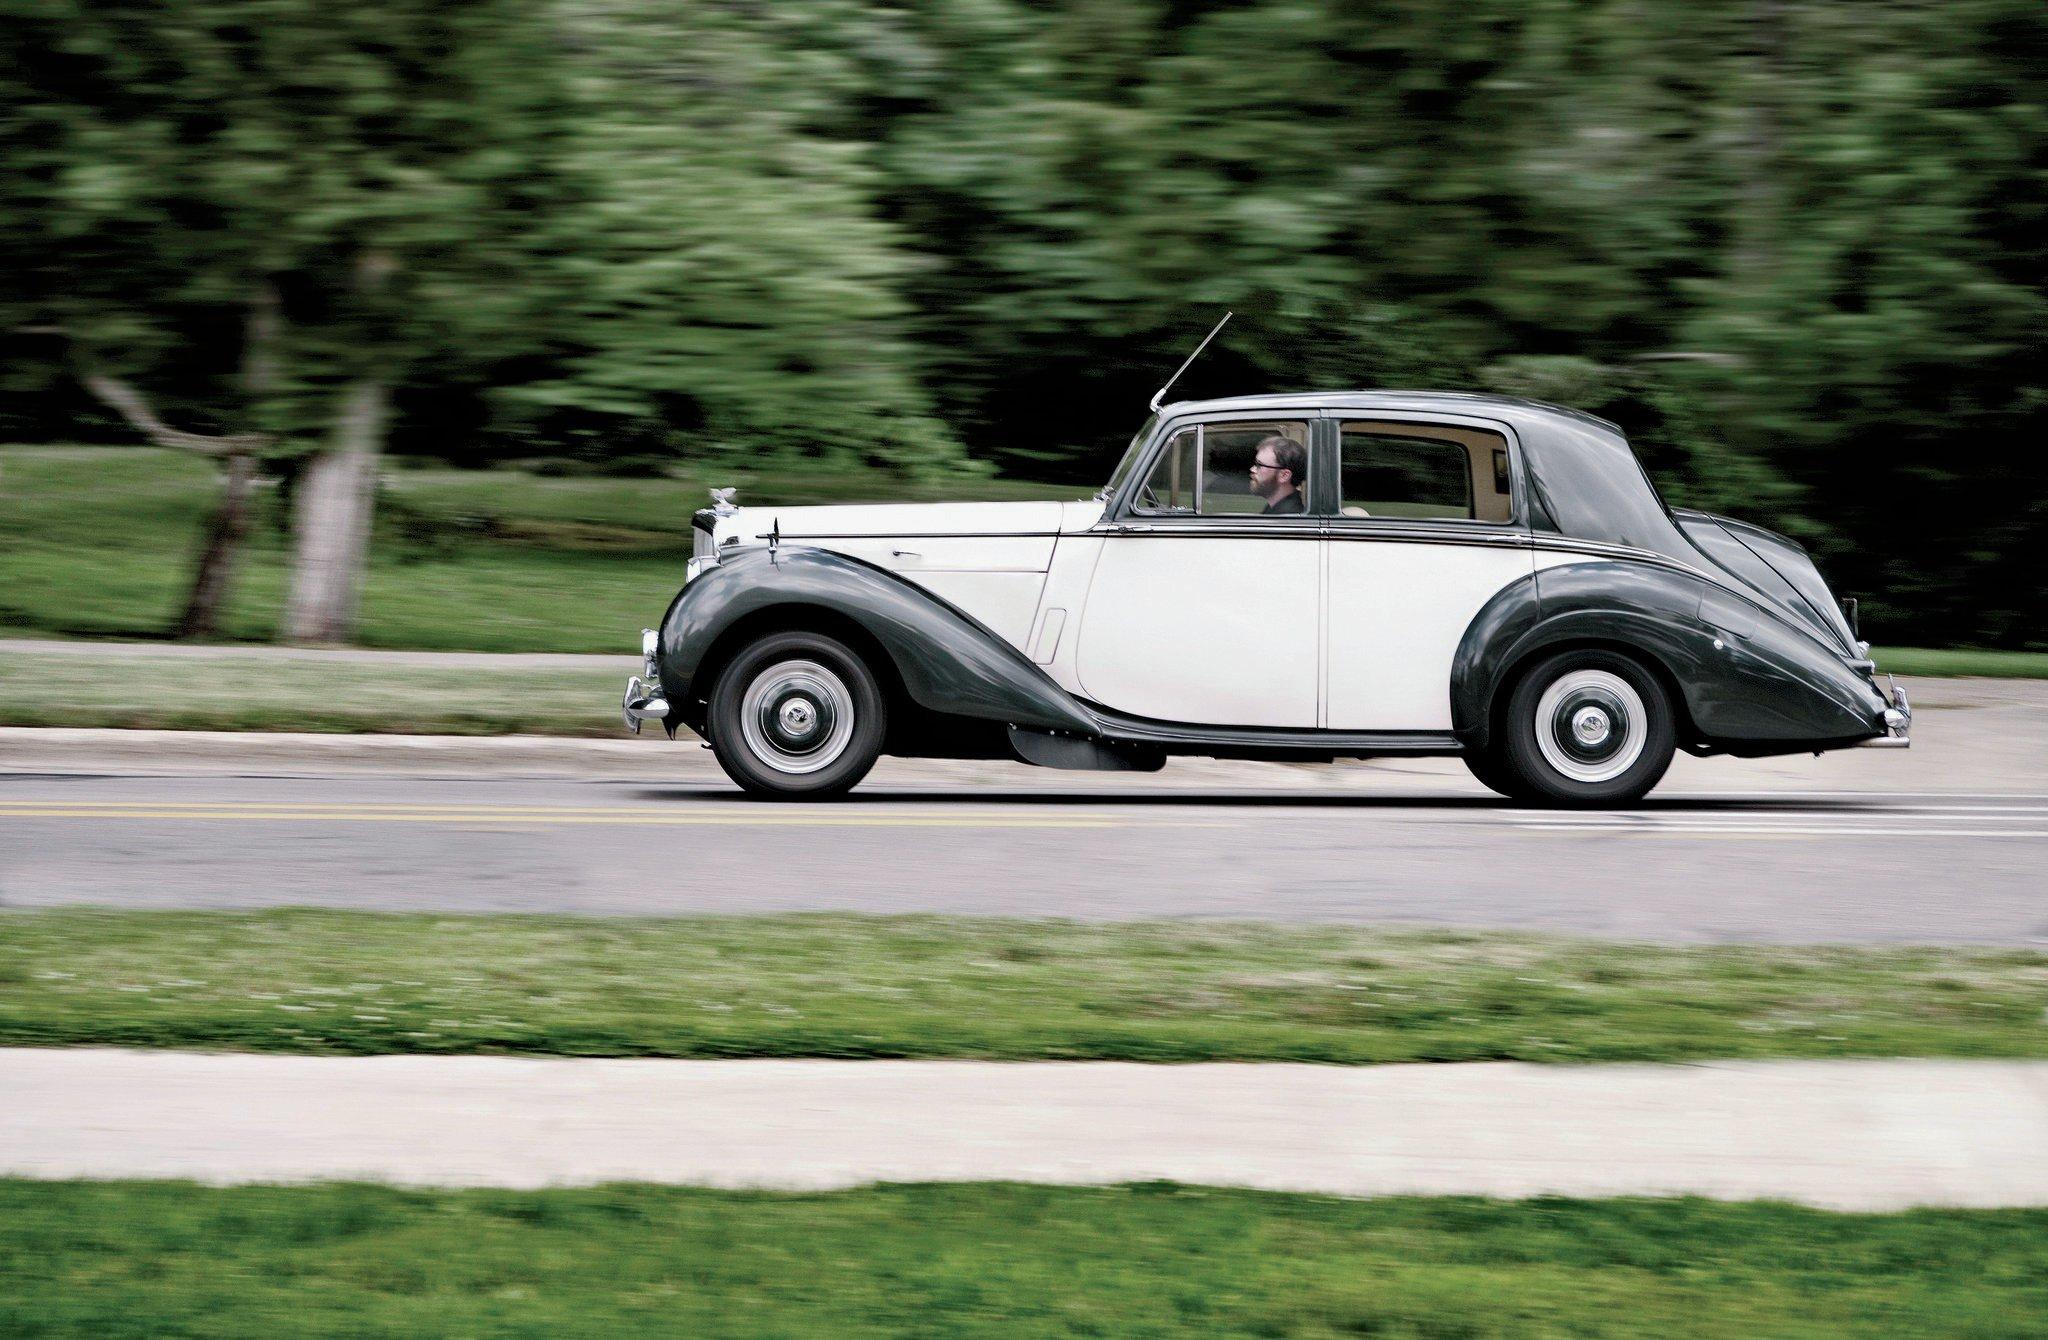 slider sale i bentley old william anson car for six ben speed ltd